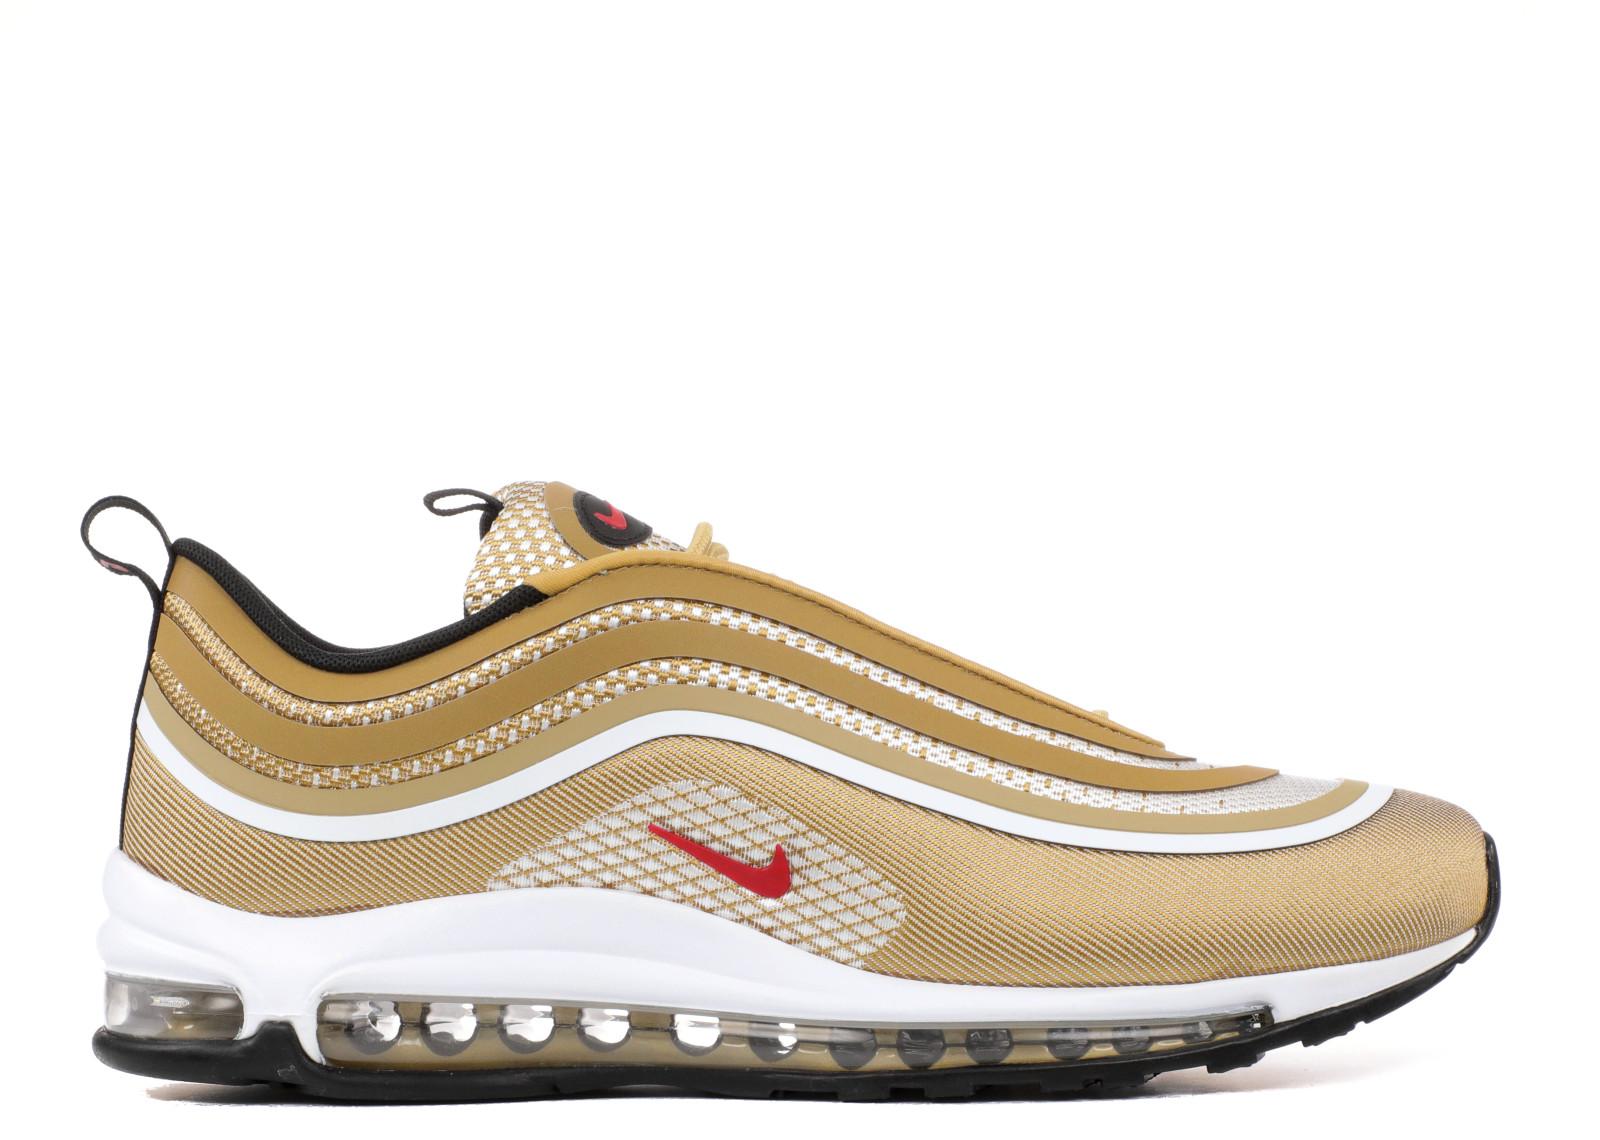 huge discount 6d07d 246b0 Nike Air Max 97 Ultra 17 Metallic Gold